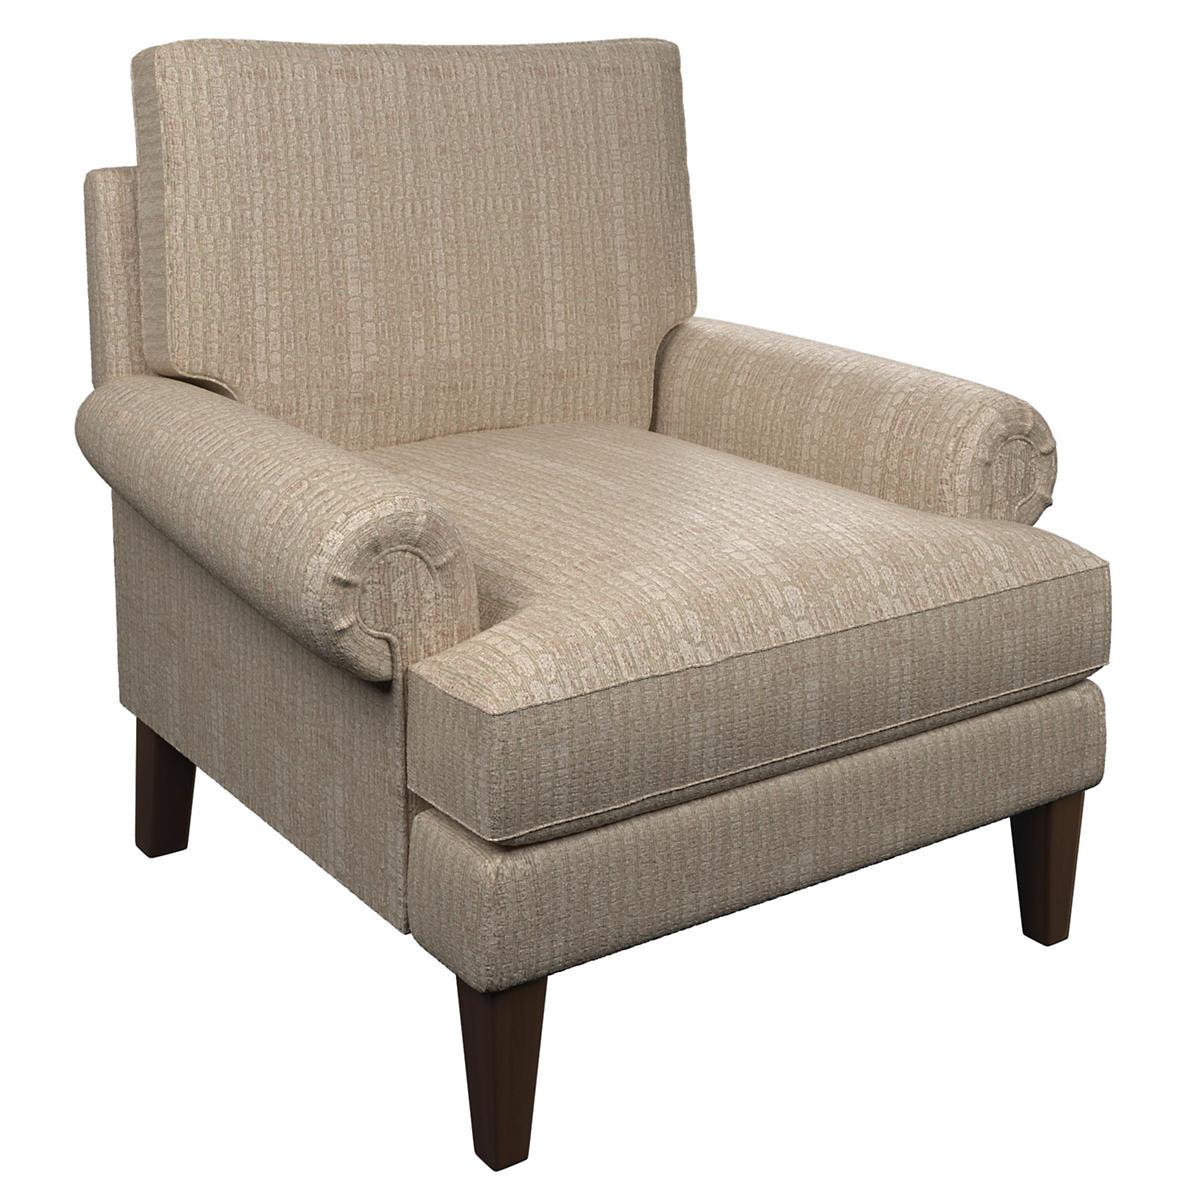 Pebble Slipper Pink Easton Chair